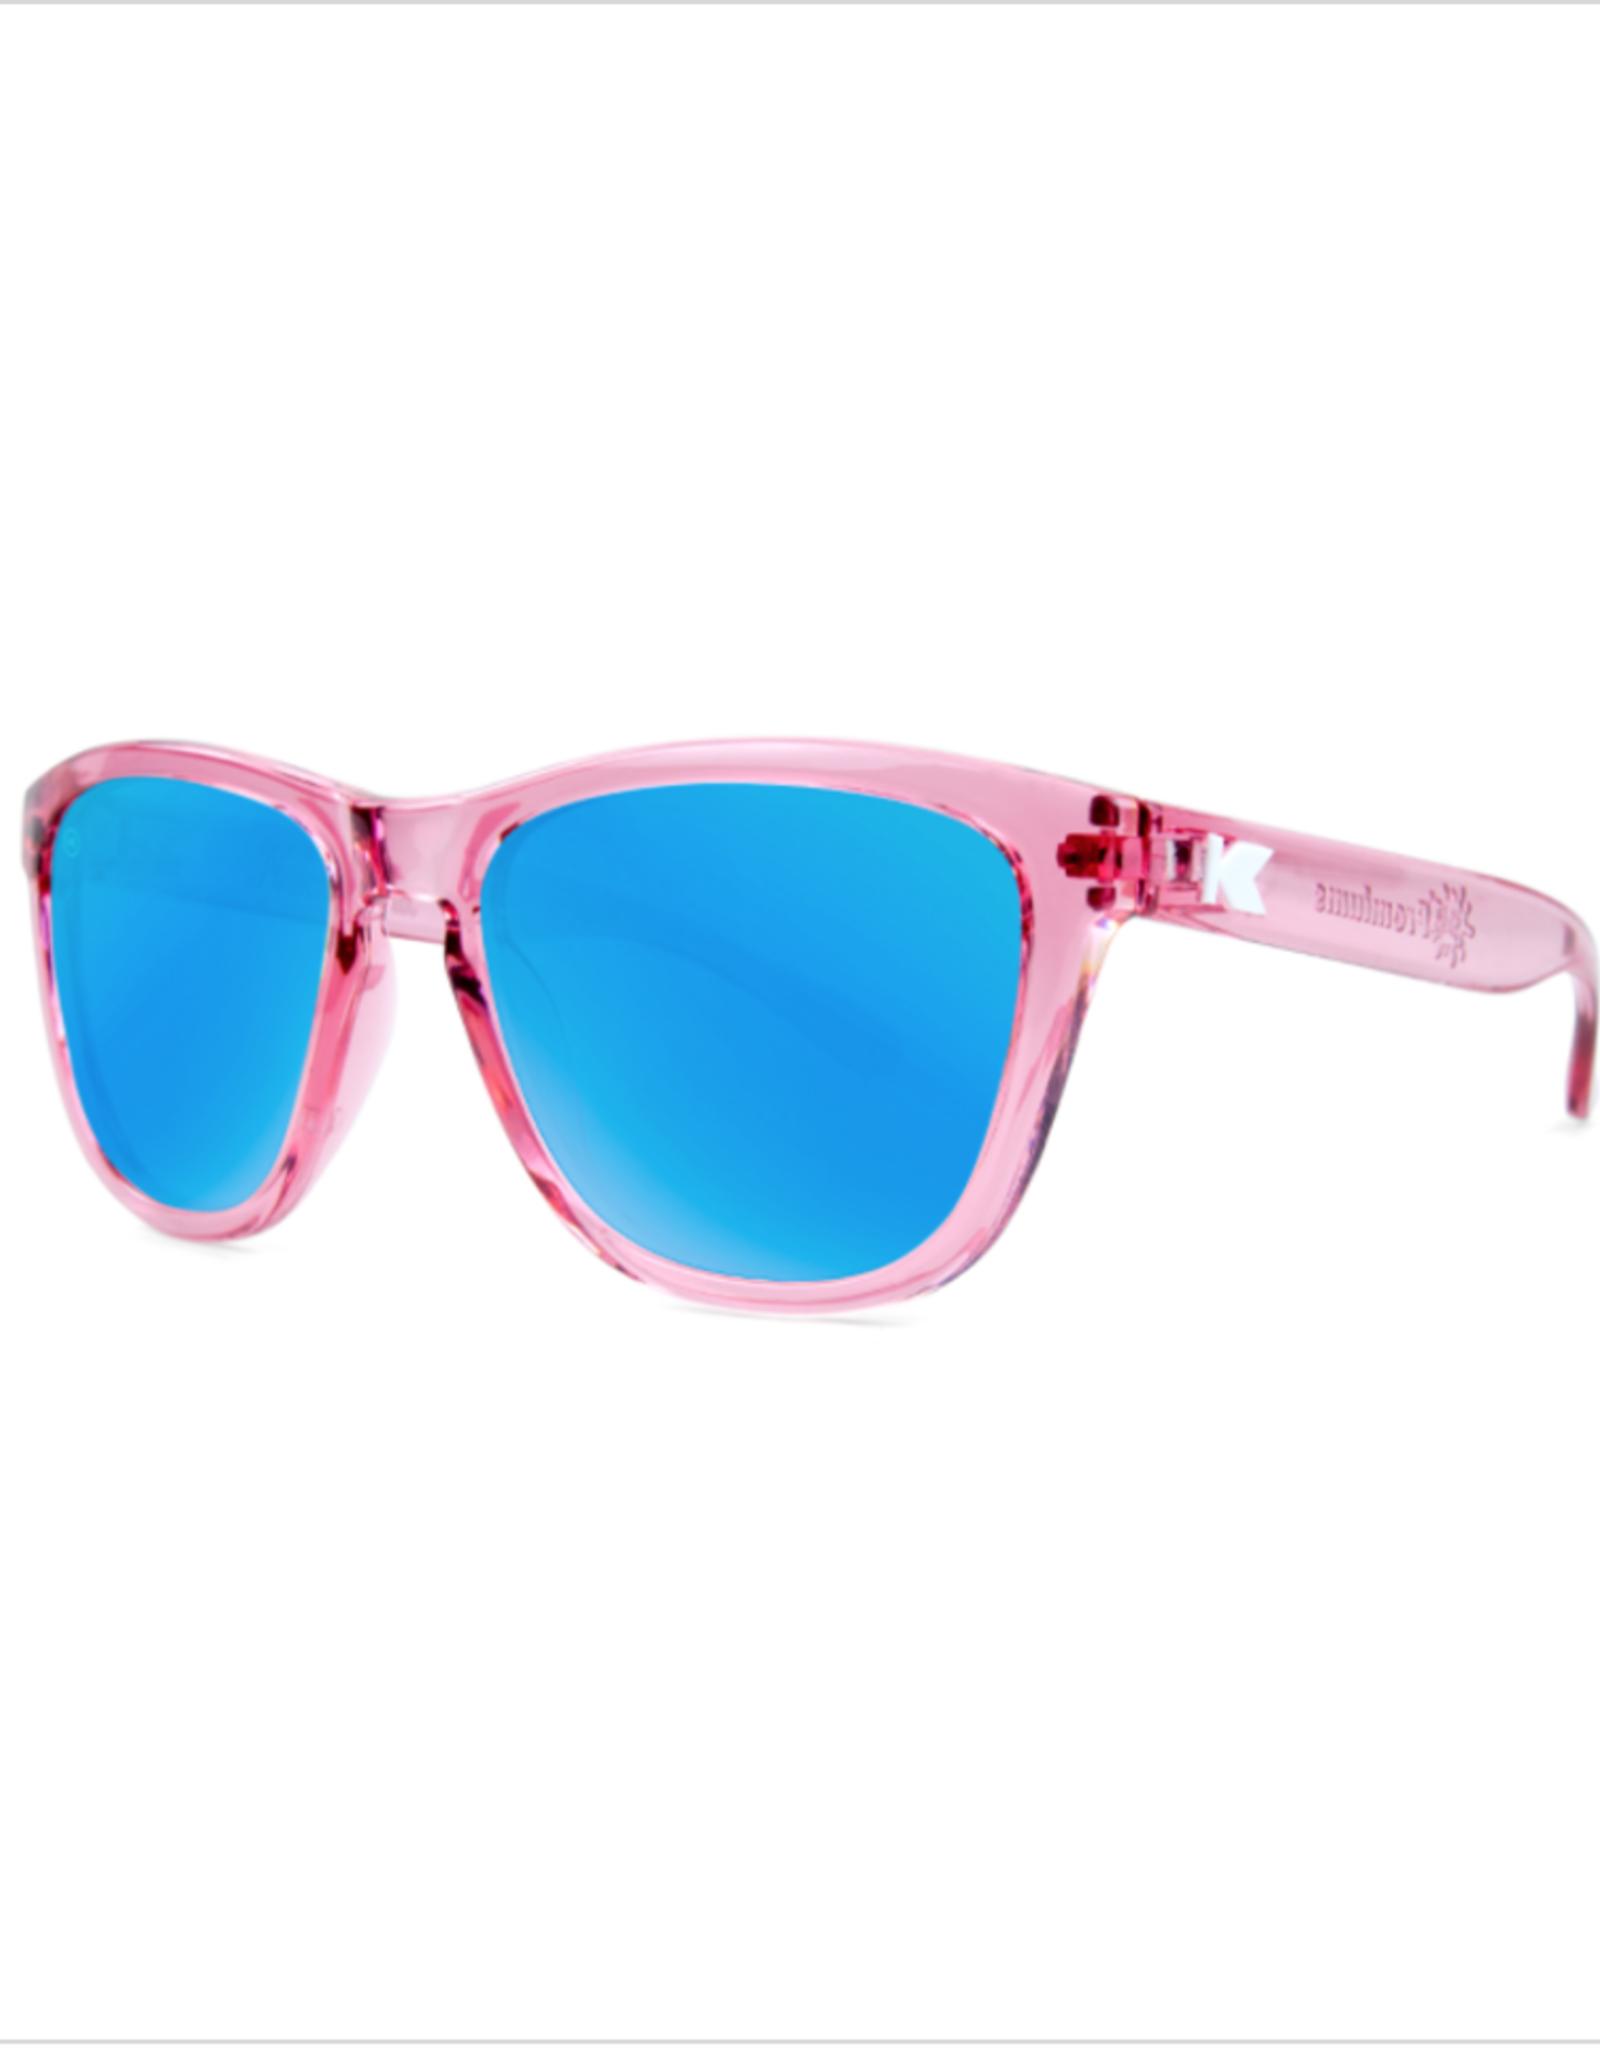 Knockaround Sunnies Glossy Pink/Aqua